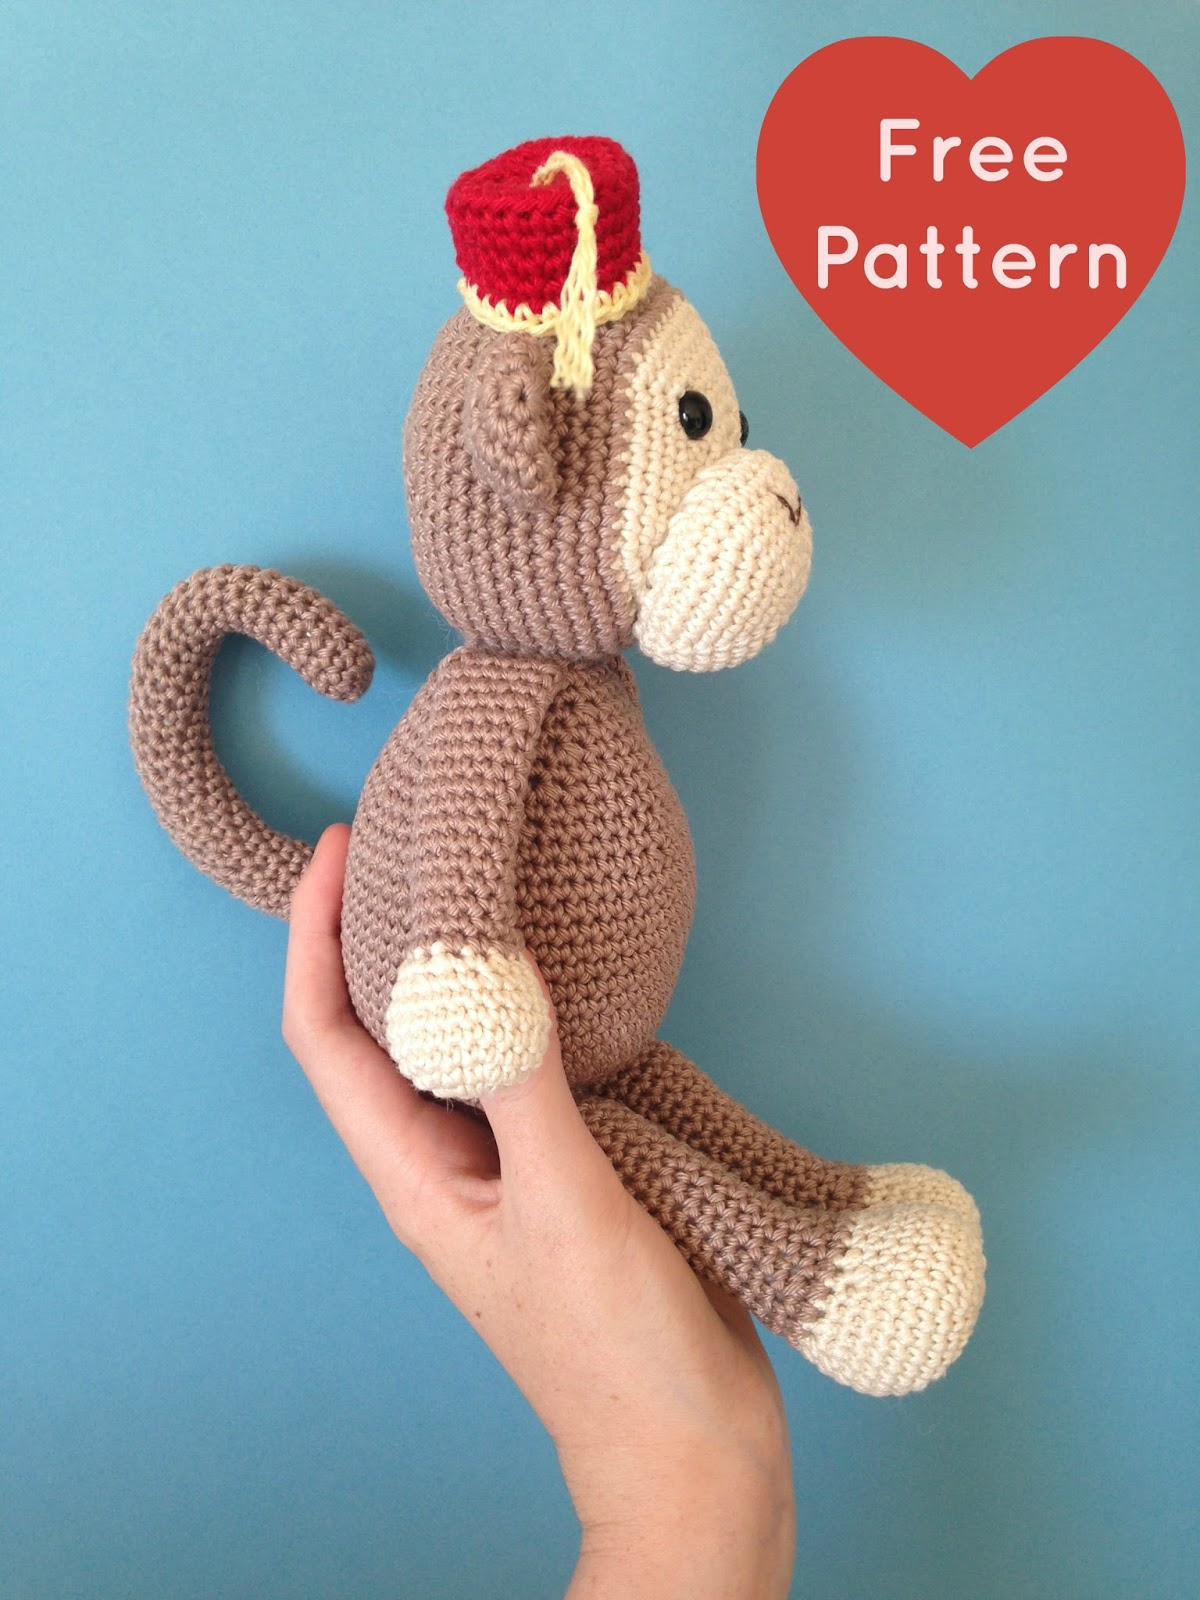 Amigurumi Monkey Softies Crochet Free Patterns • DIY How To | 1600x1200